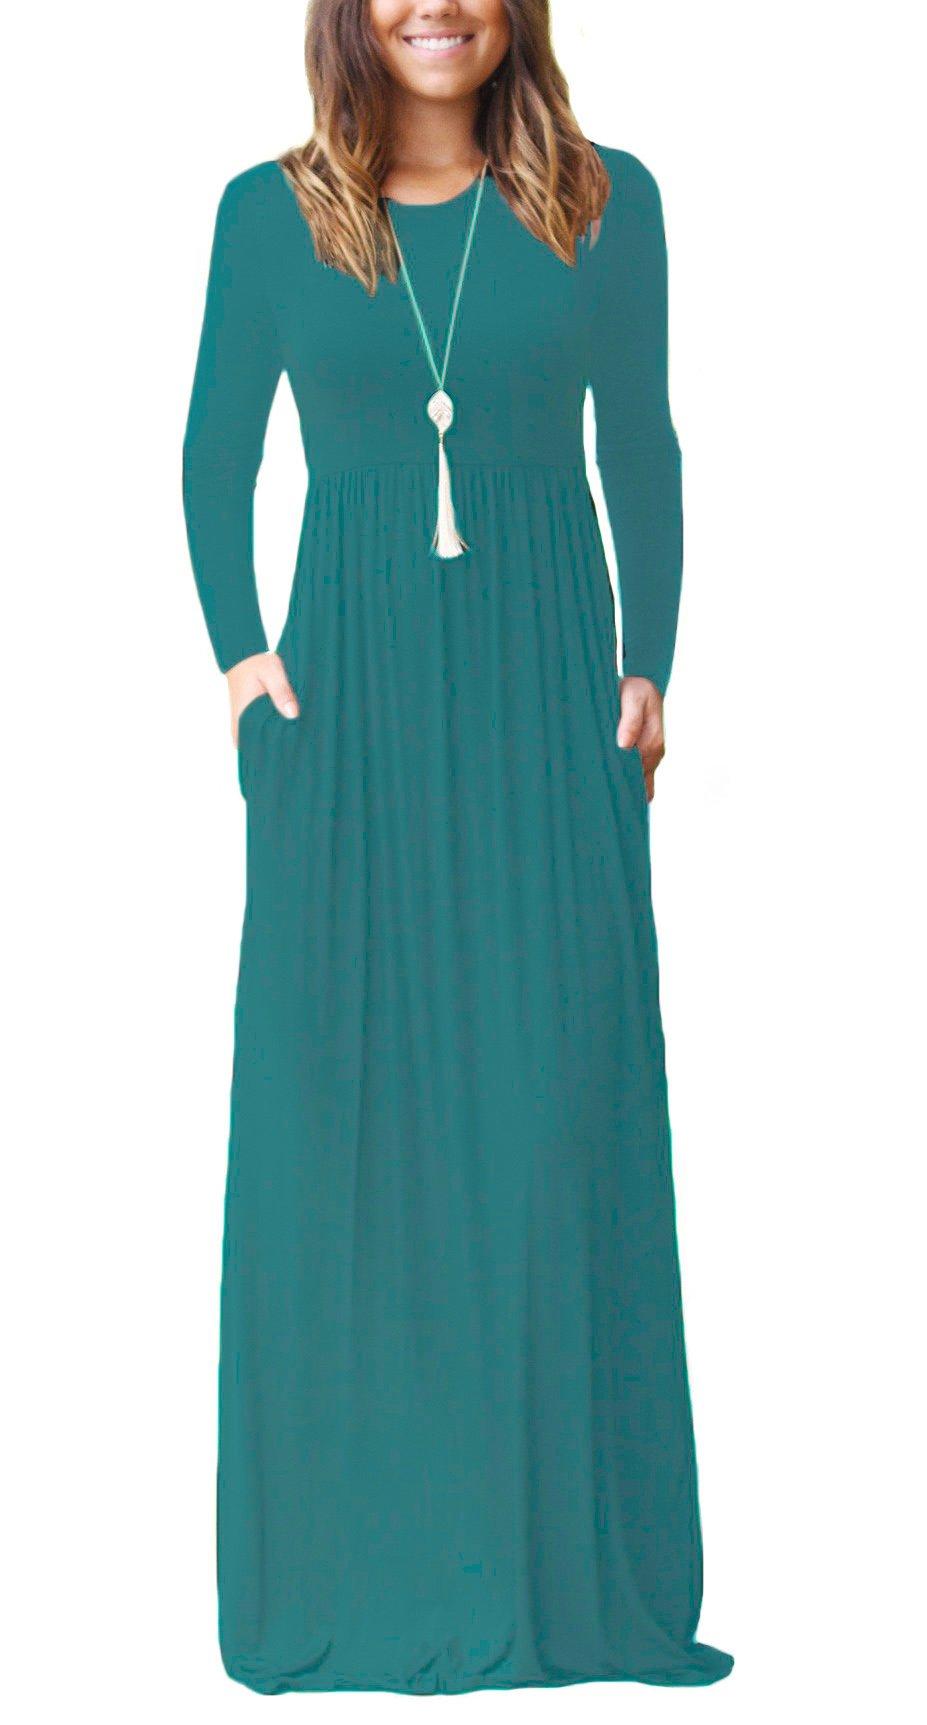 Available at Amazon: DEARCASE Women Long Sleeve Loose Plain Maxi Pockets Dresses Casual Long Dresses